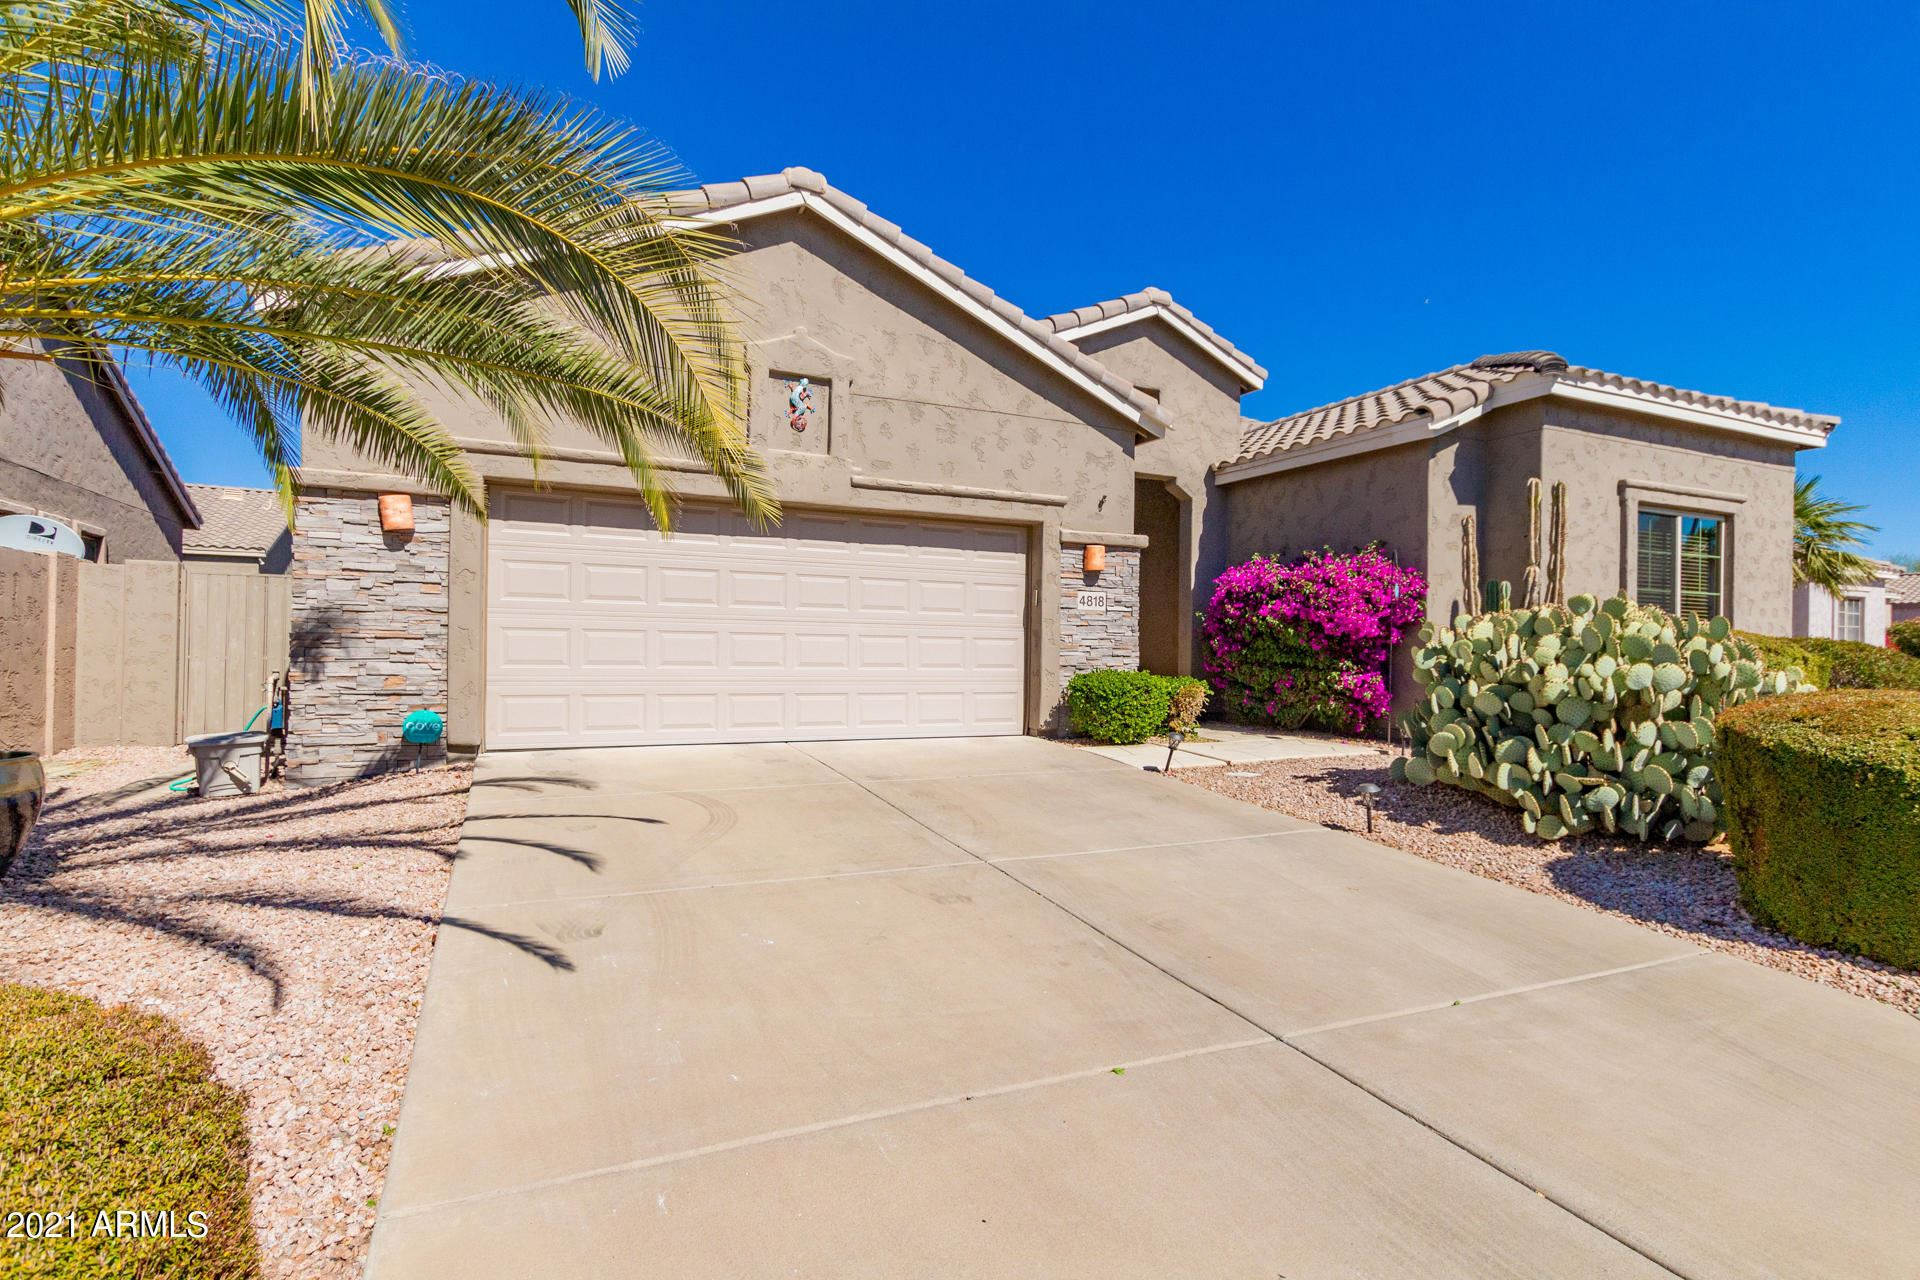 Photo of 4818 E BLUEFIELD Avenue, Scottsdale, AZ 85254 (MLS # 6201576)